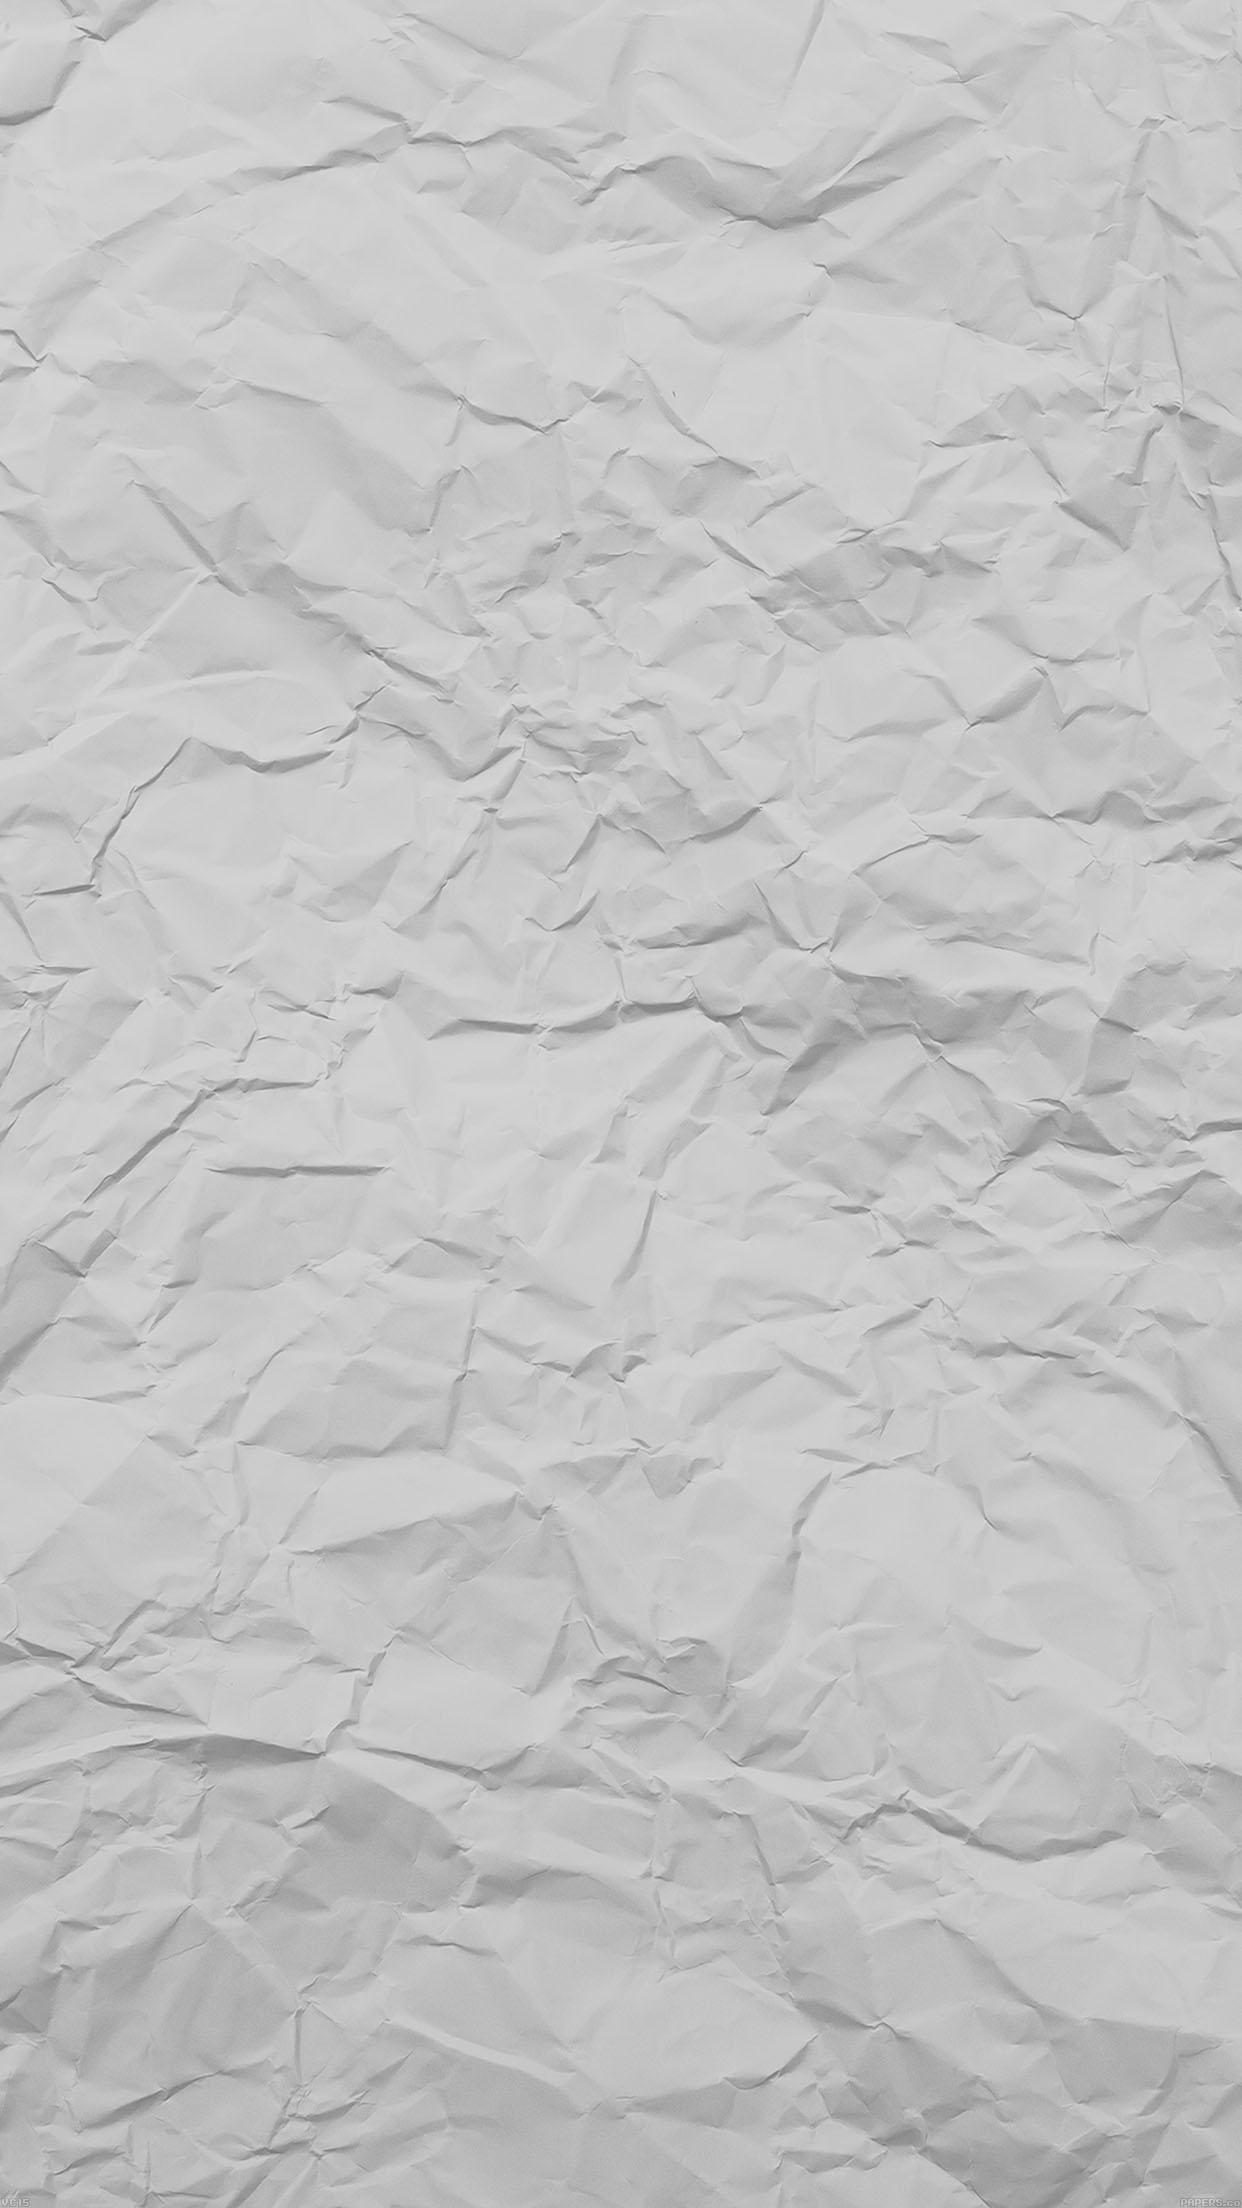 Must see Wallpaper Marble Iphone 6 - papers  Trends_807753.jpg